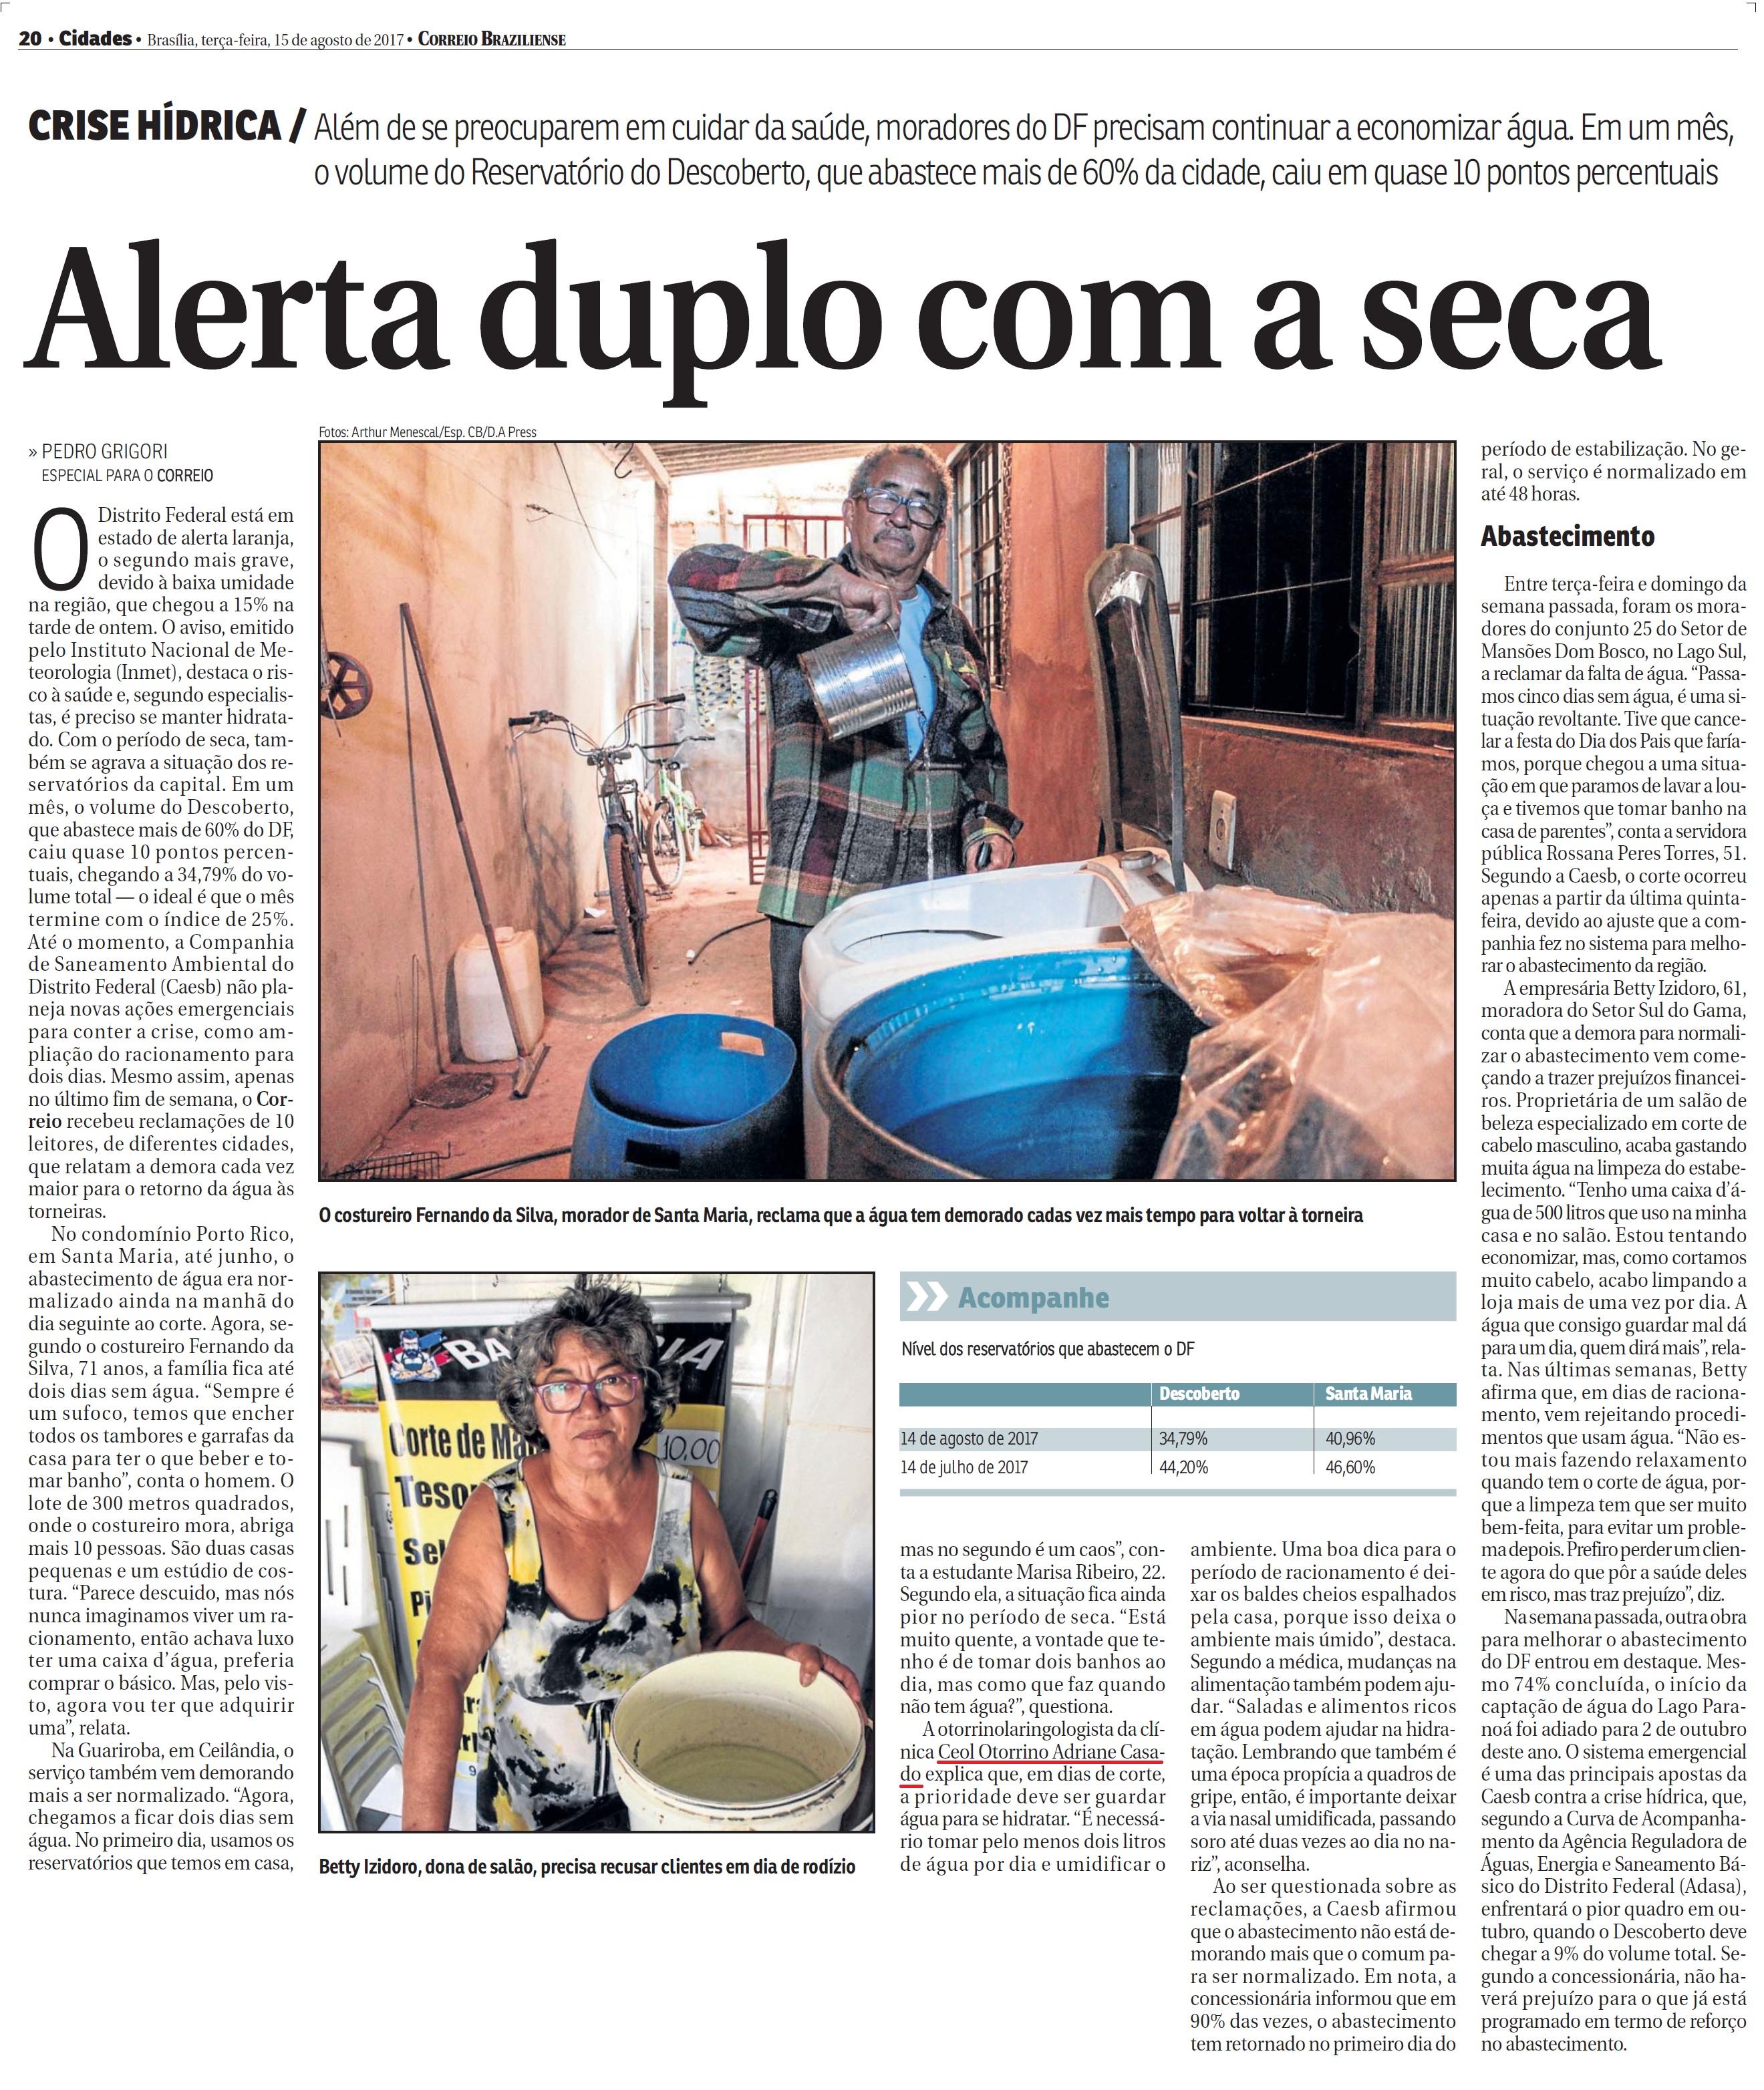 Correio Braziliense - Dra. Adriane Casado - 15-08-2017